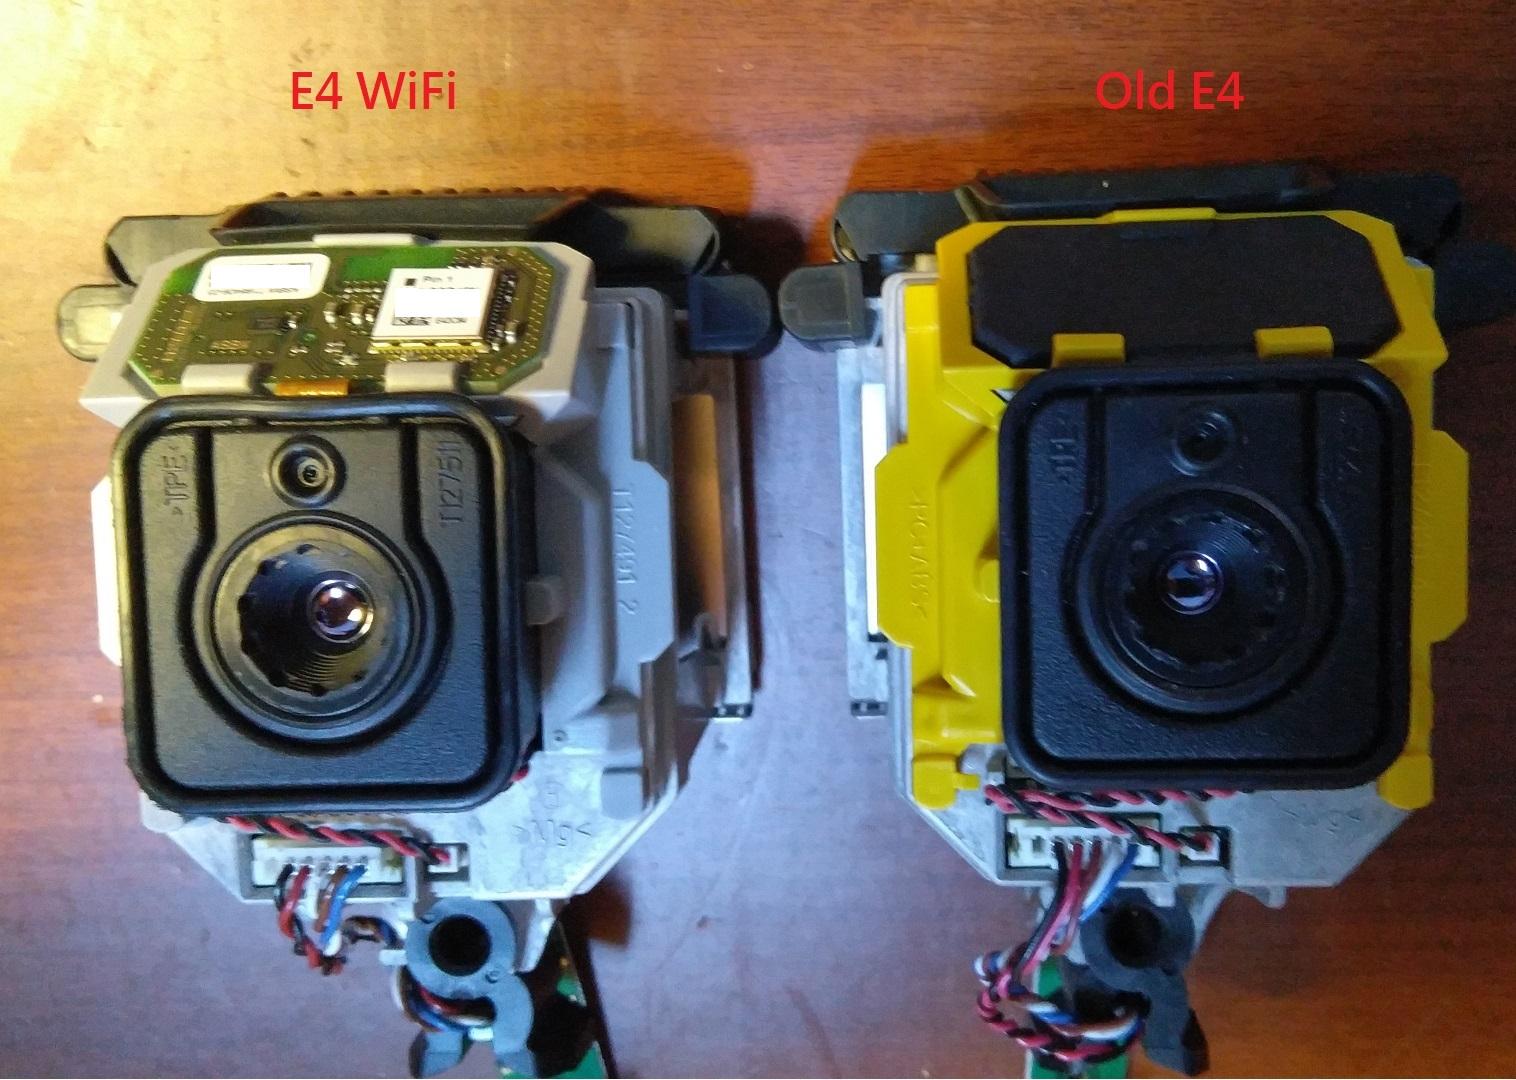 FLIR E4 Wifi Resolution and Menu Hack Thread - Page 3